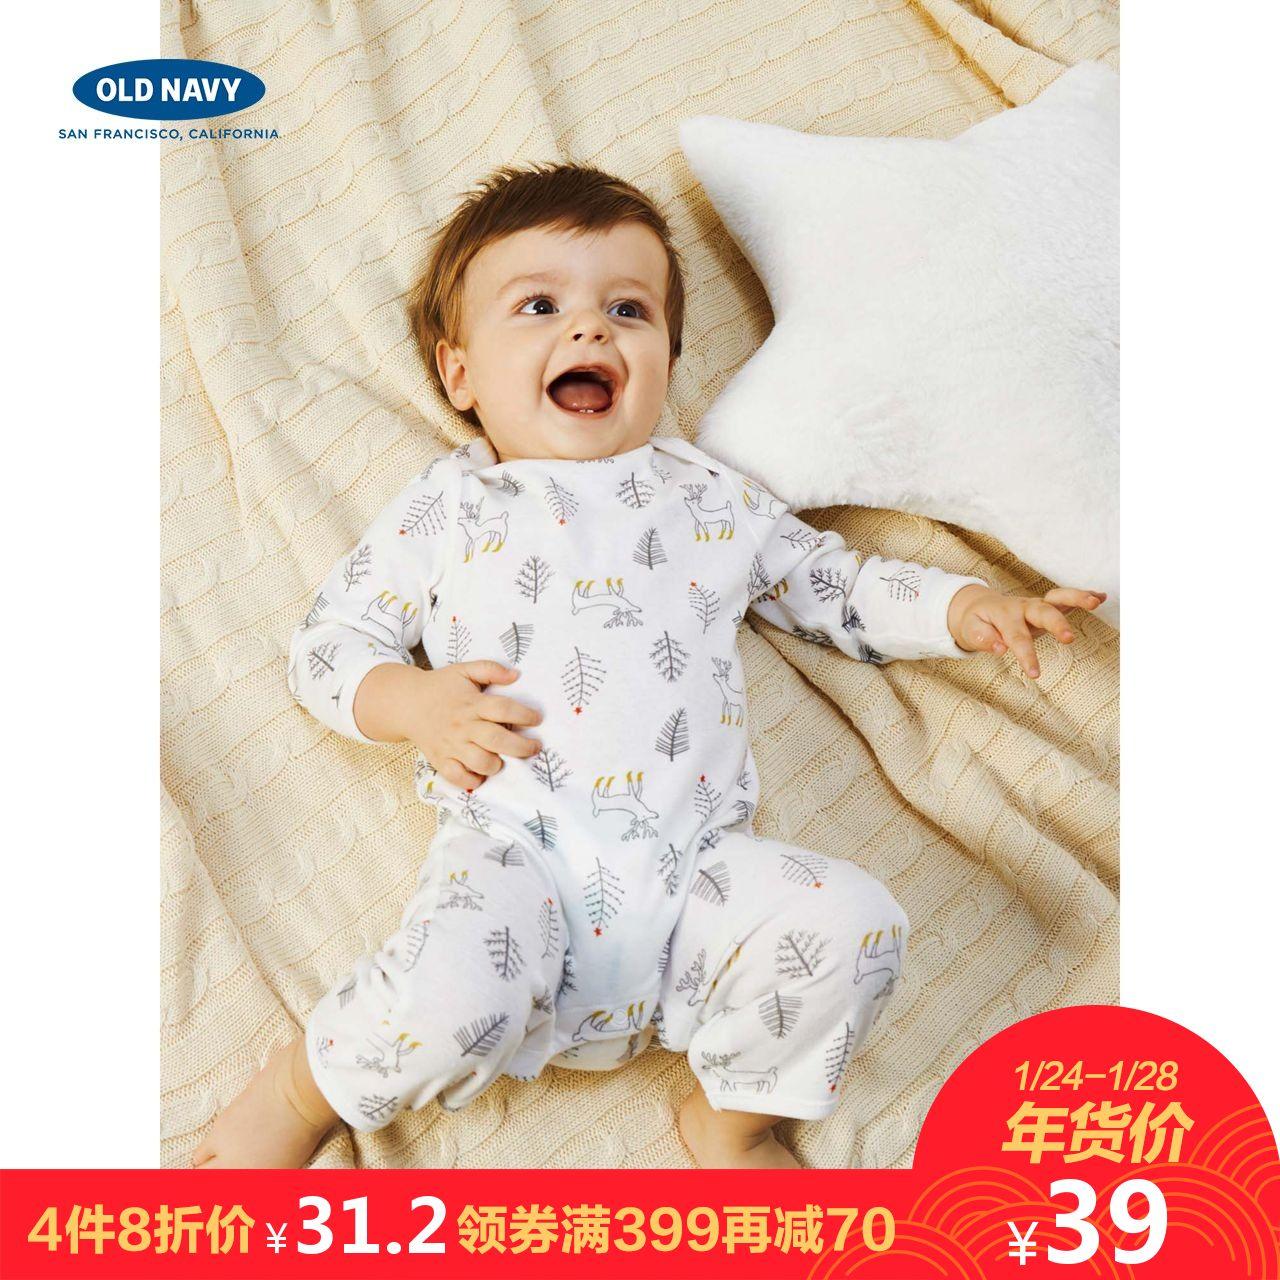 Old Navy男女婴儿 驯鹿图案印花针织一件式连体衣857170 老海军X